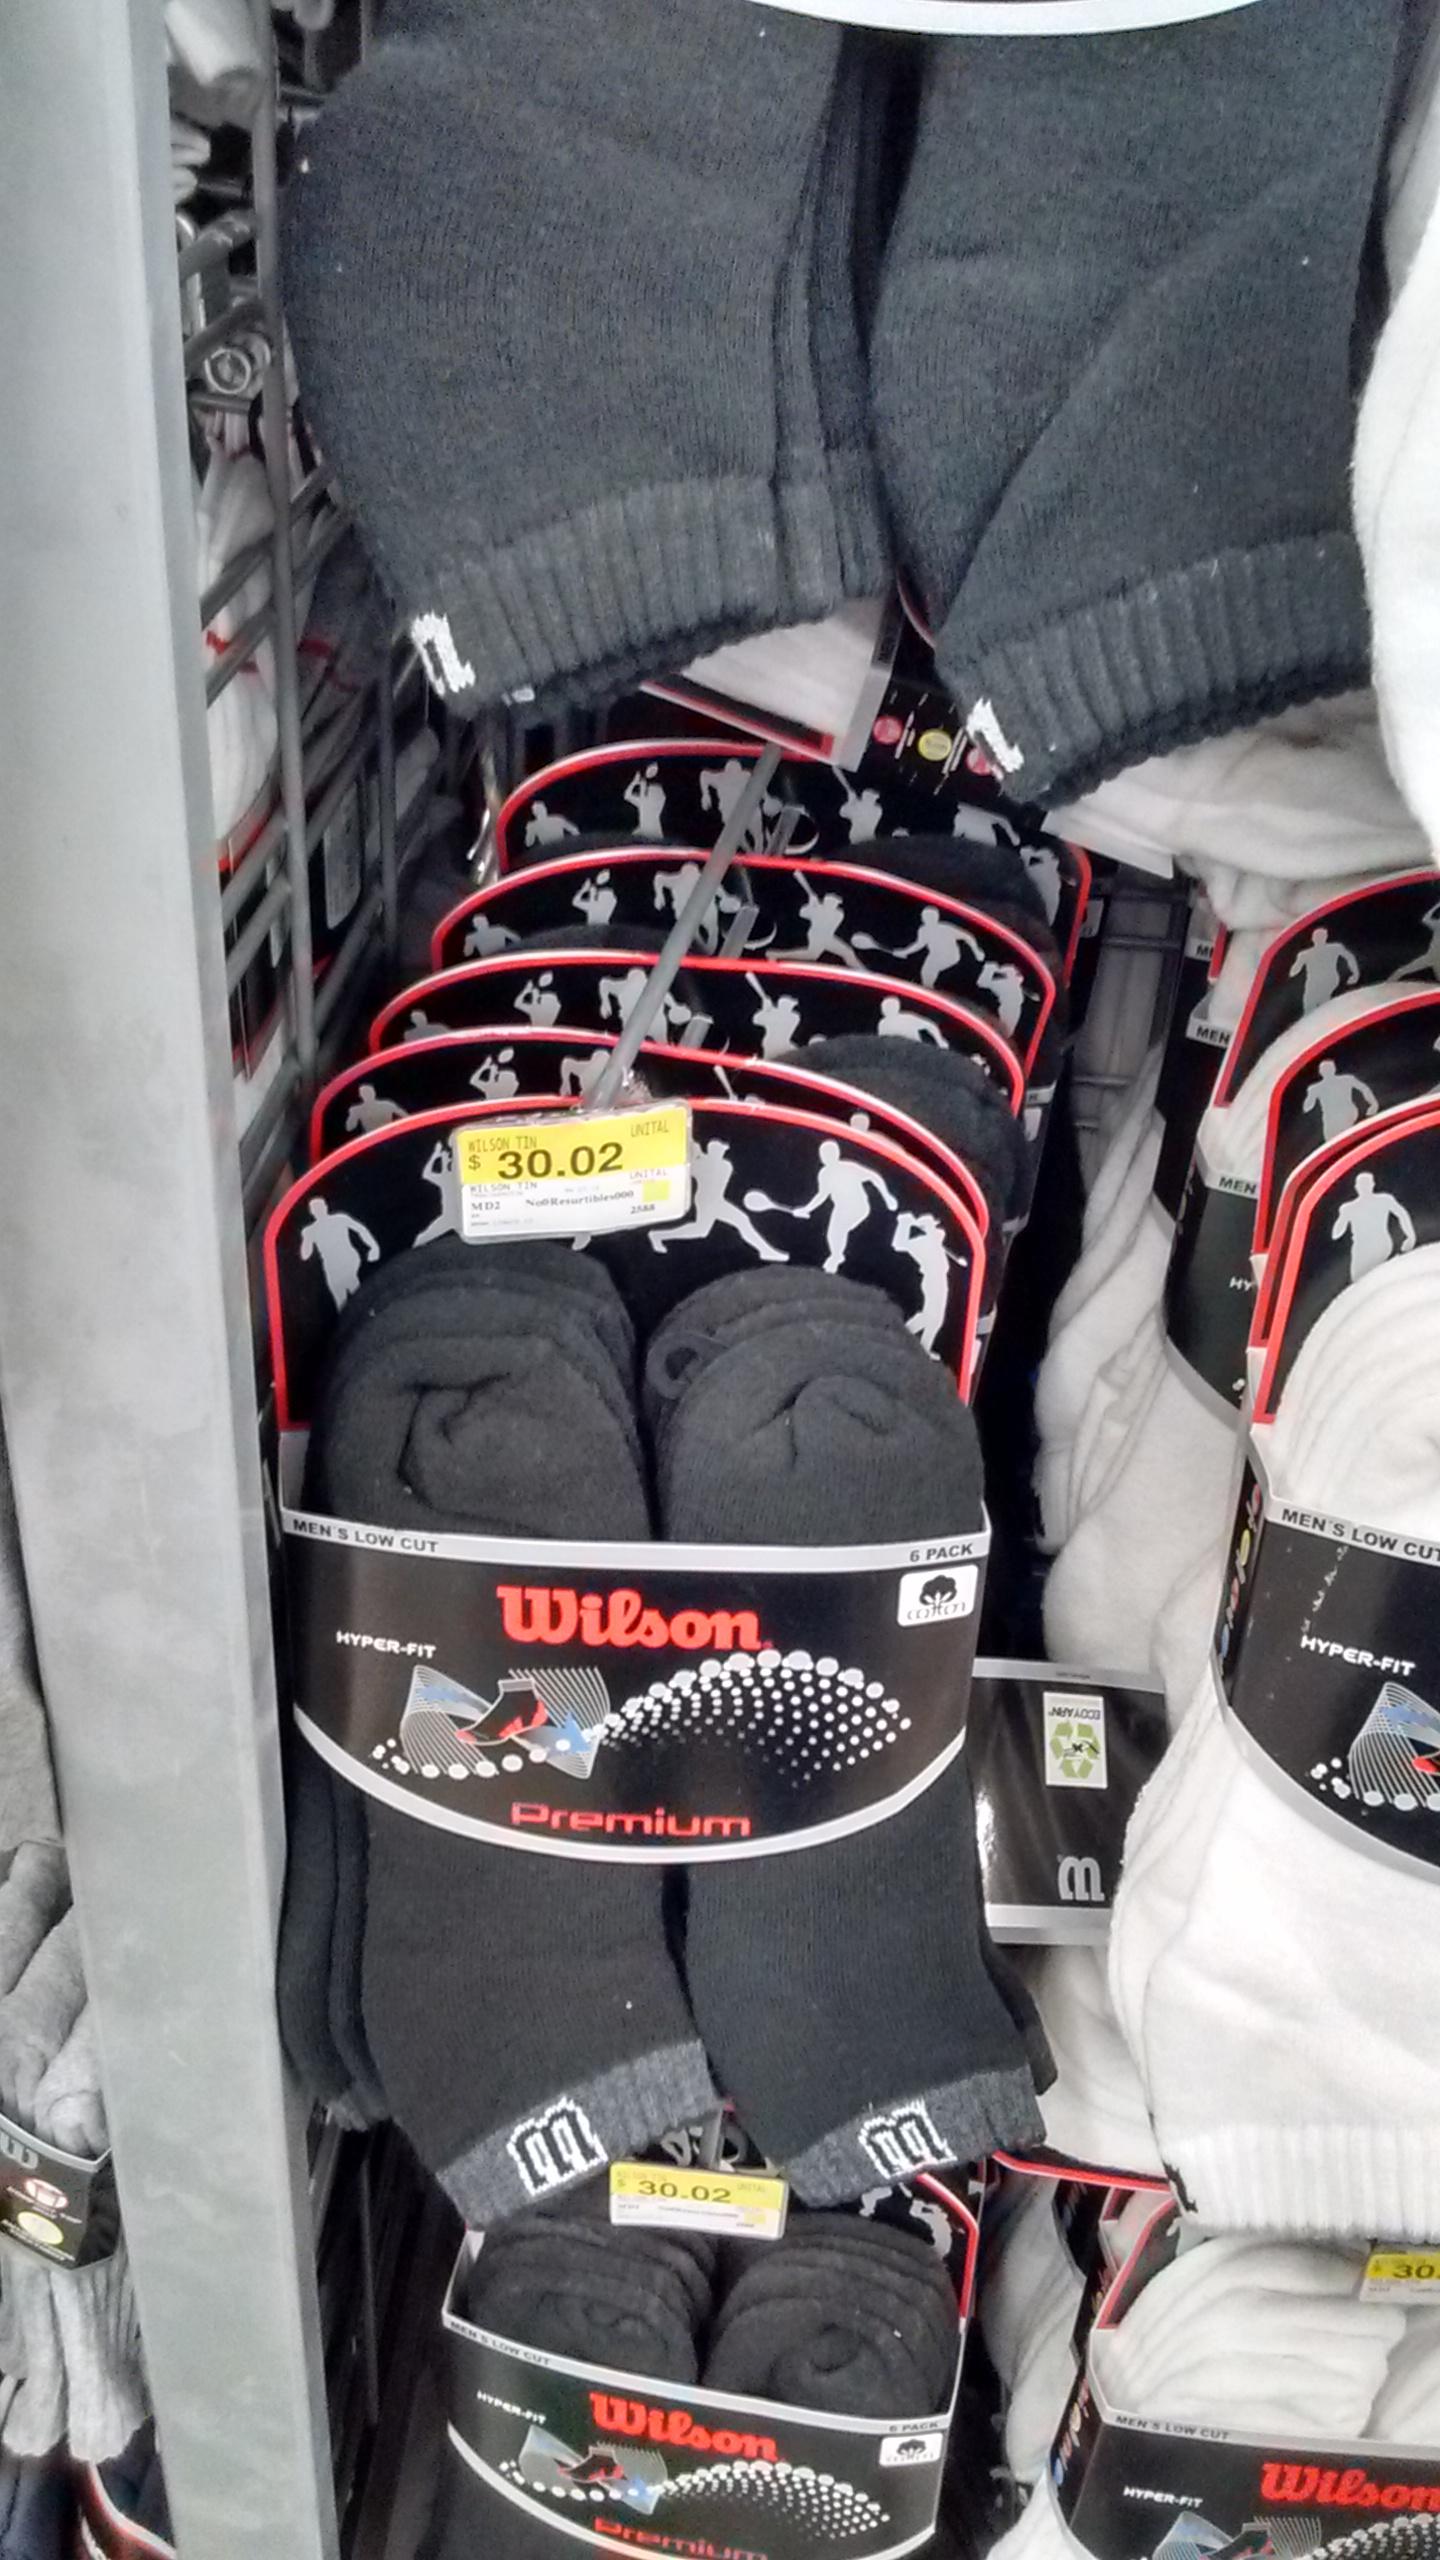 Bodega Aurrerá: Tines 6 pack Wilson de $60 a $30.02